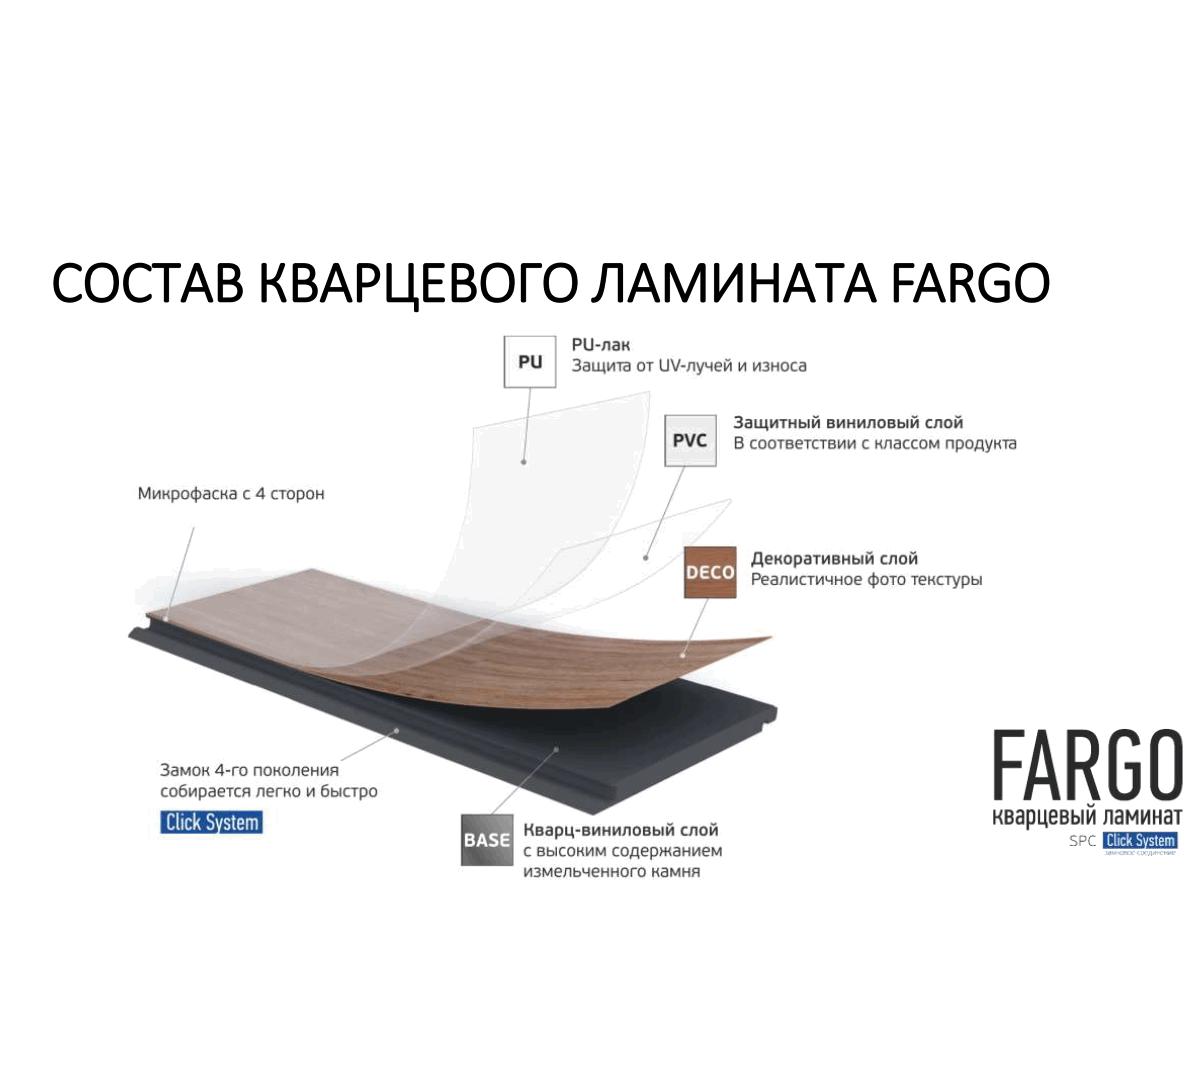 "Кварцевый ламинат SPC Fargo Comfort VL 88042-001""Дуб Шервуд"" (1220*180*4 мм) 10шт/2,196м2"